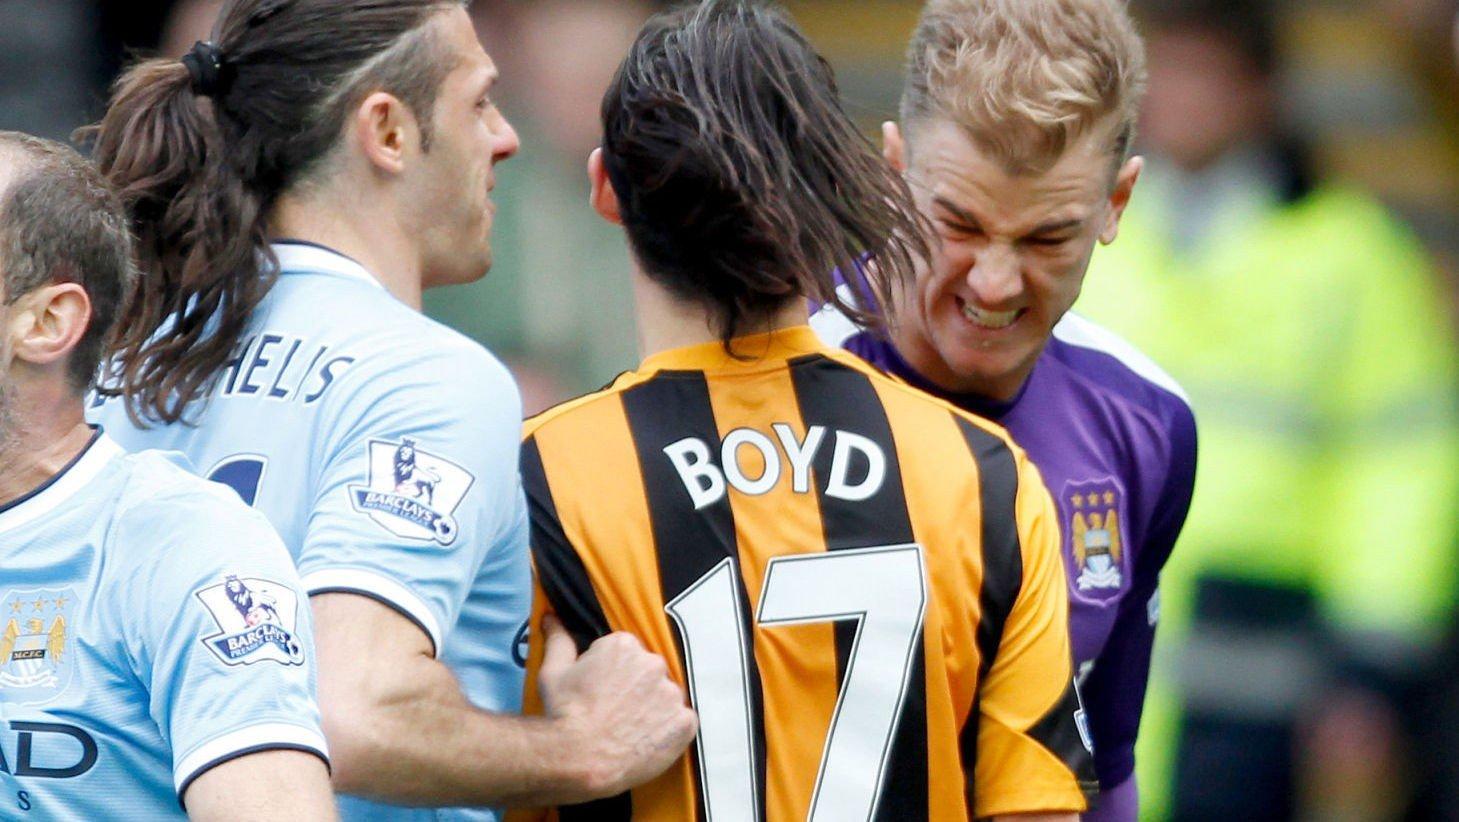 SPYTTET? Hulls George Boyd skal ha spyttet på Manchester Citys Joe Hart under lørdagens kamp.